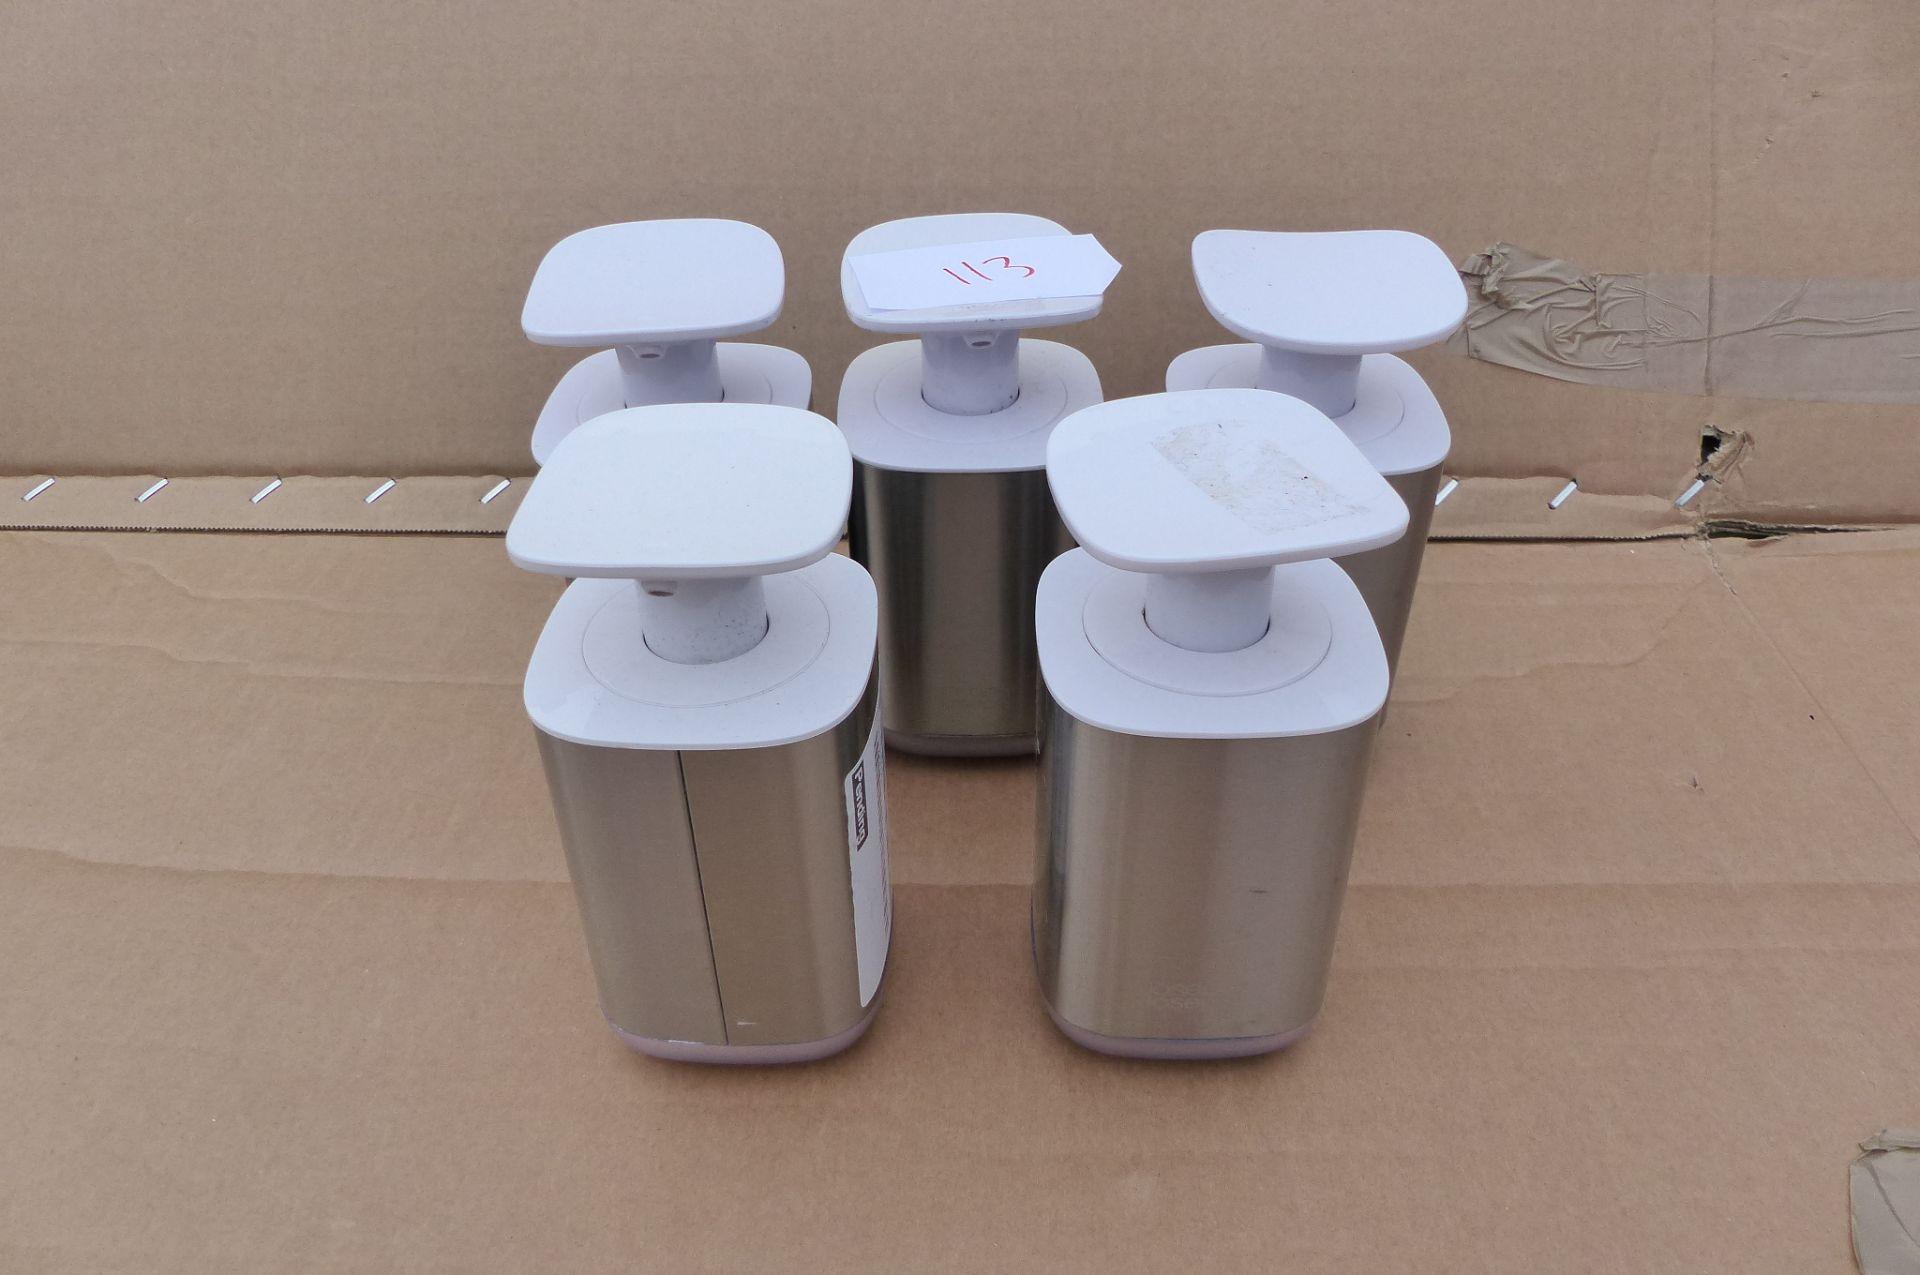 5 simplehuman soap pumps